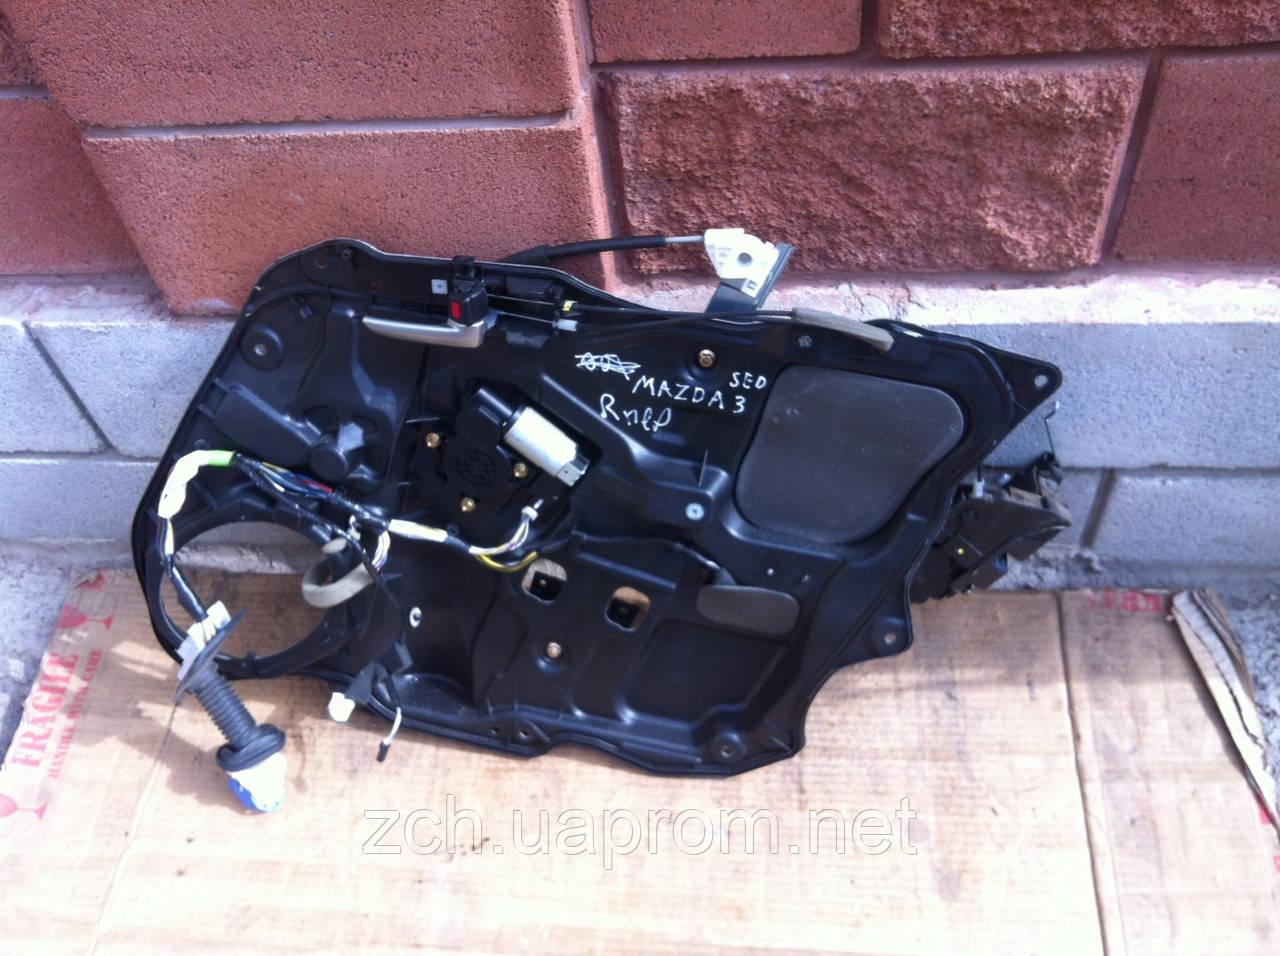 Моторчик стеклоподемника Mazda 3 Хэтчбек